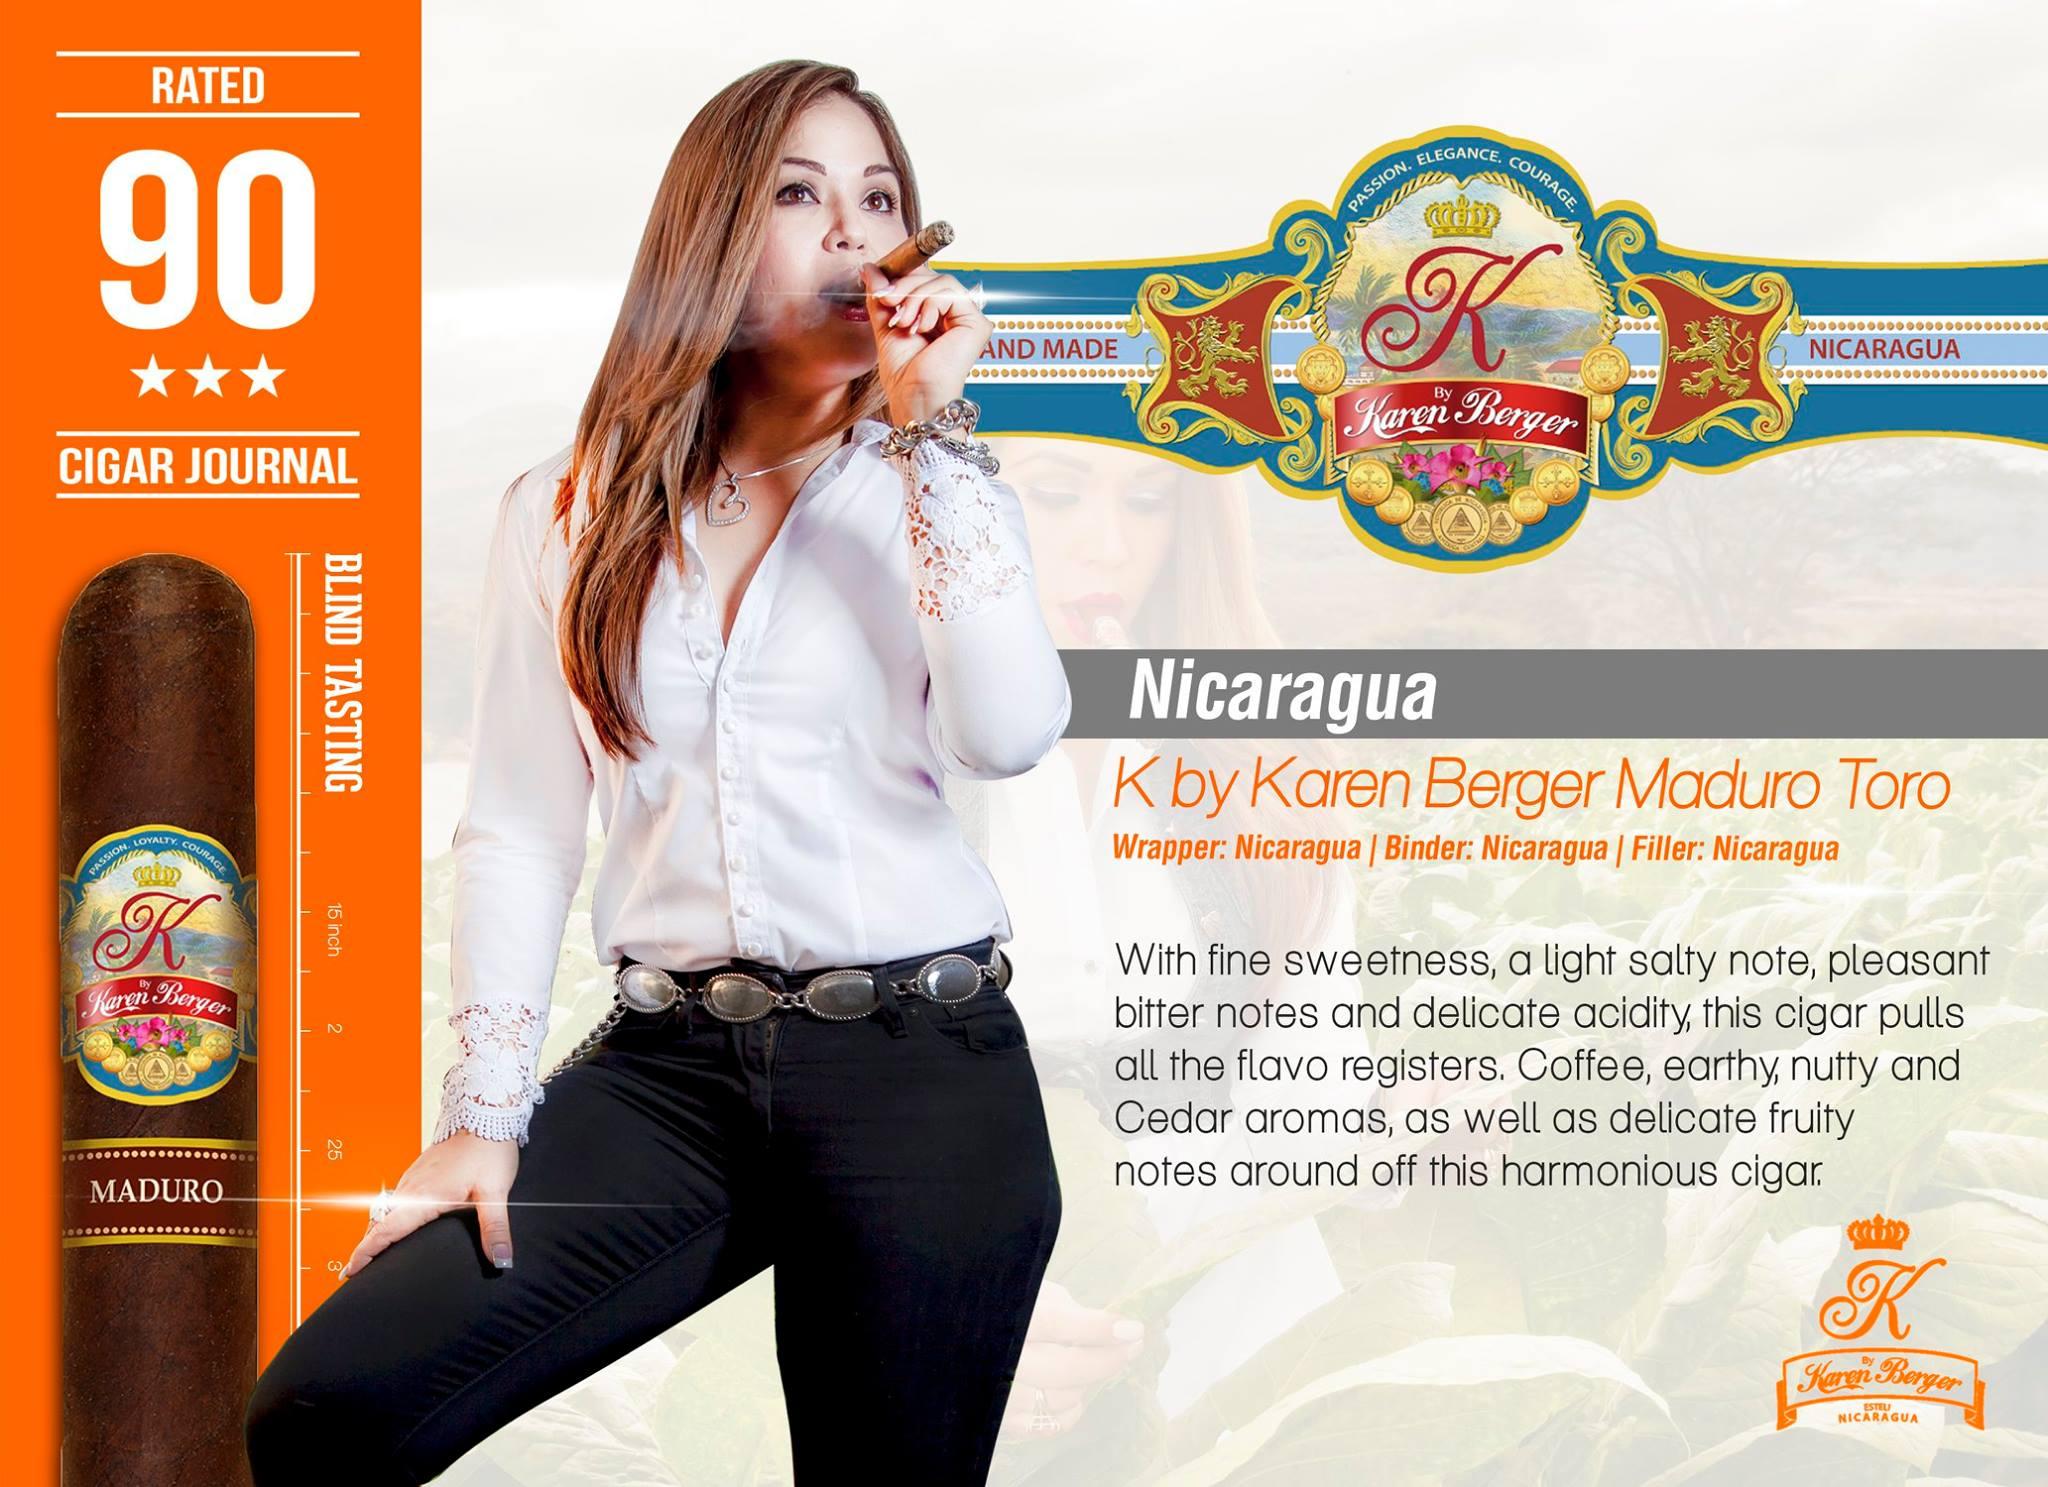 k_by_karen_berger_don_kiki_cigars_nicaraguai_szivarok_1.jpg